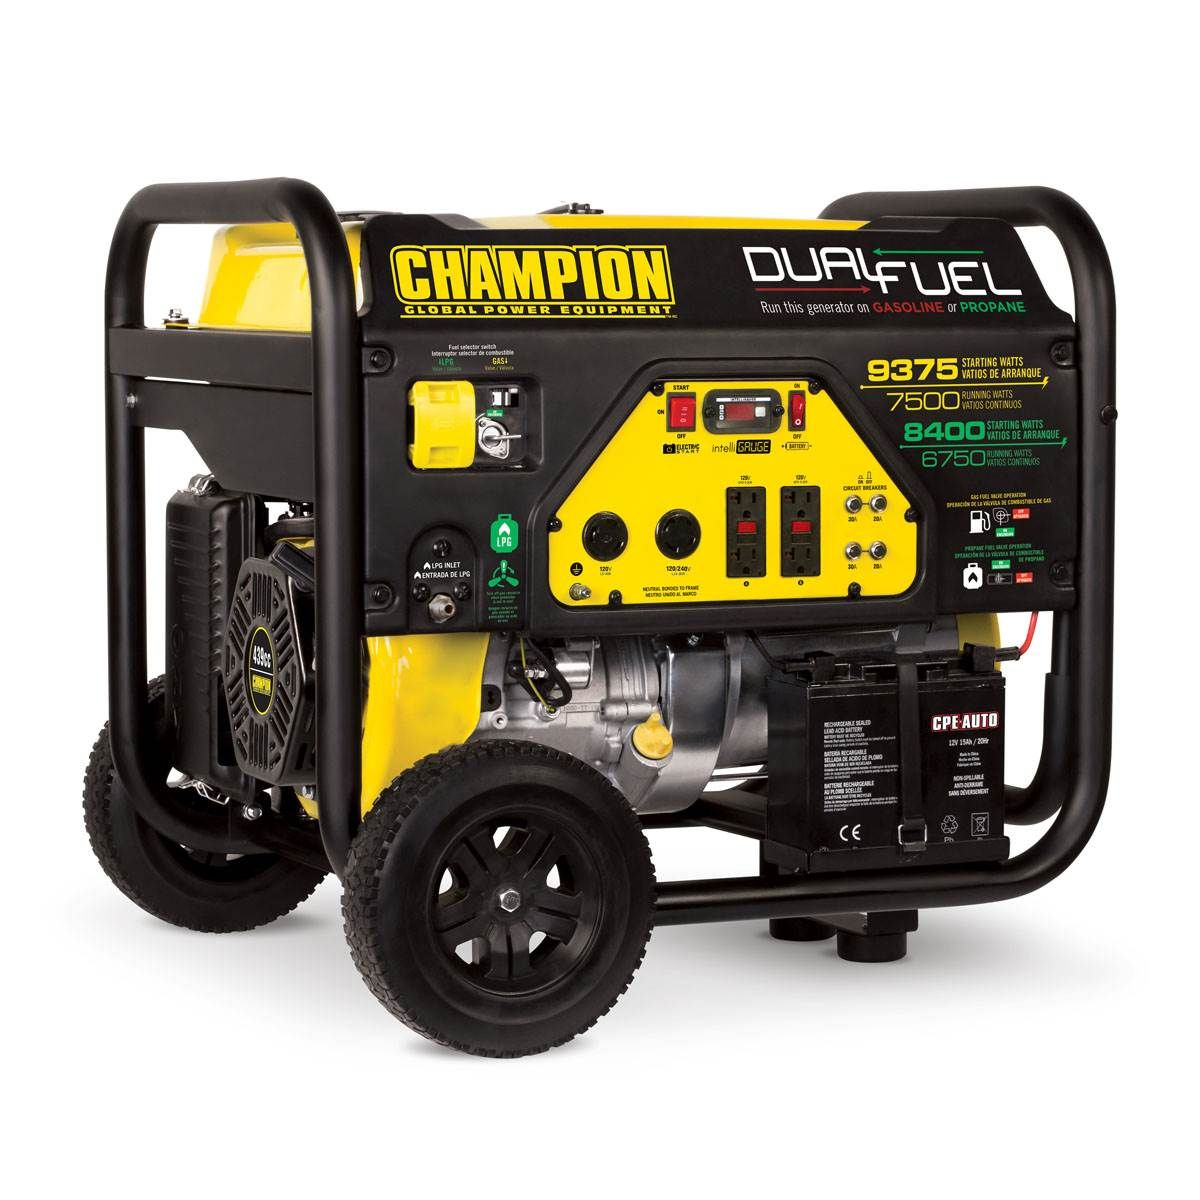 Champion Power Equipment 7500Watt Dual Fuel Portable